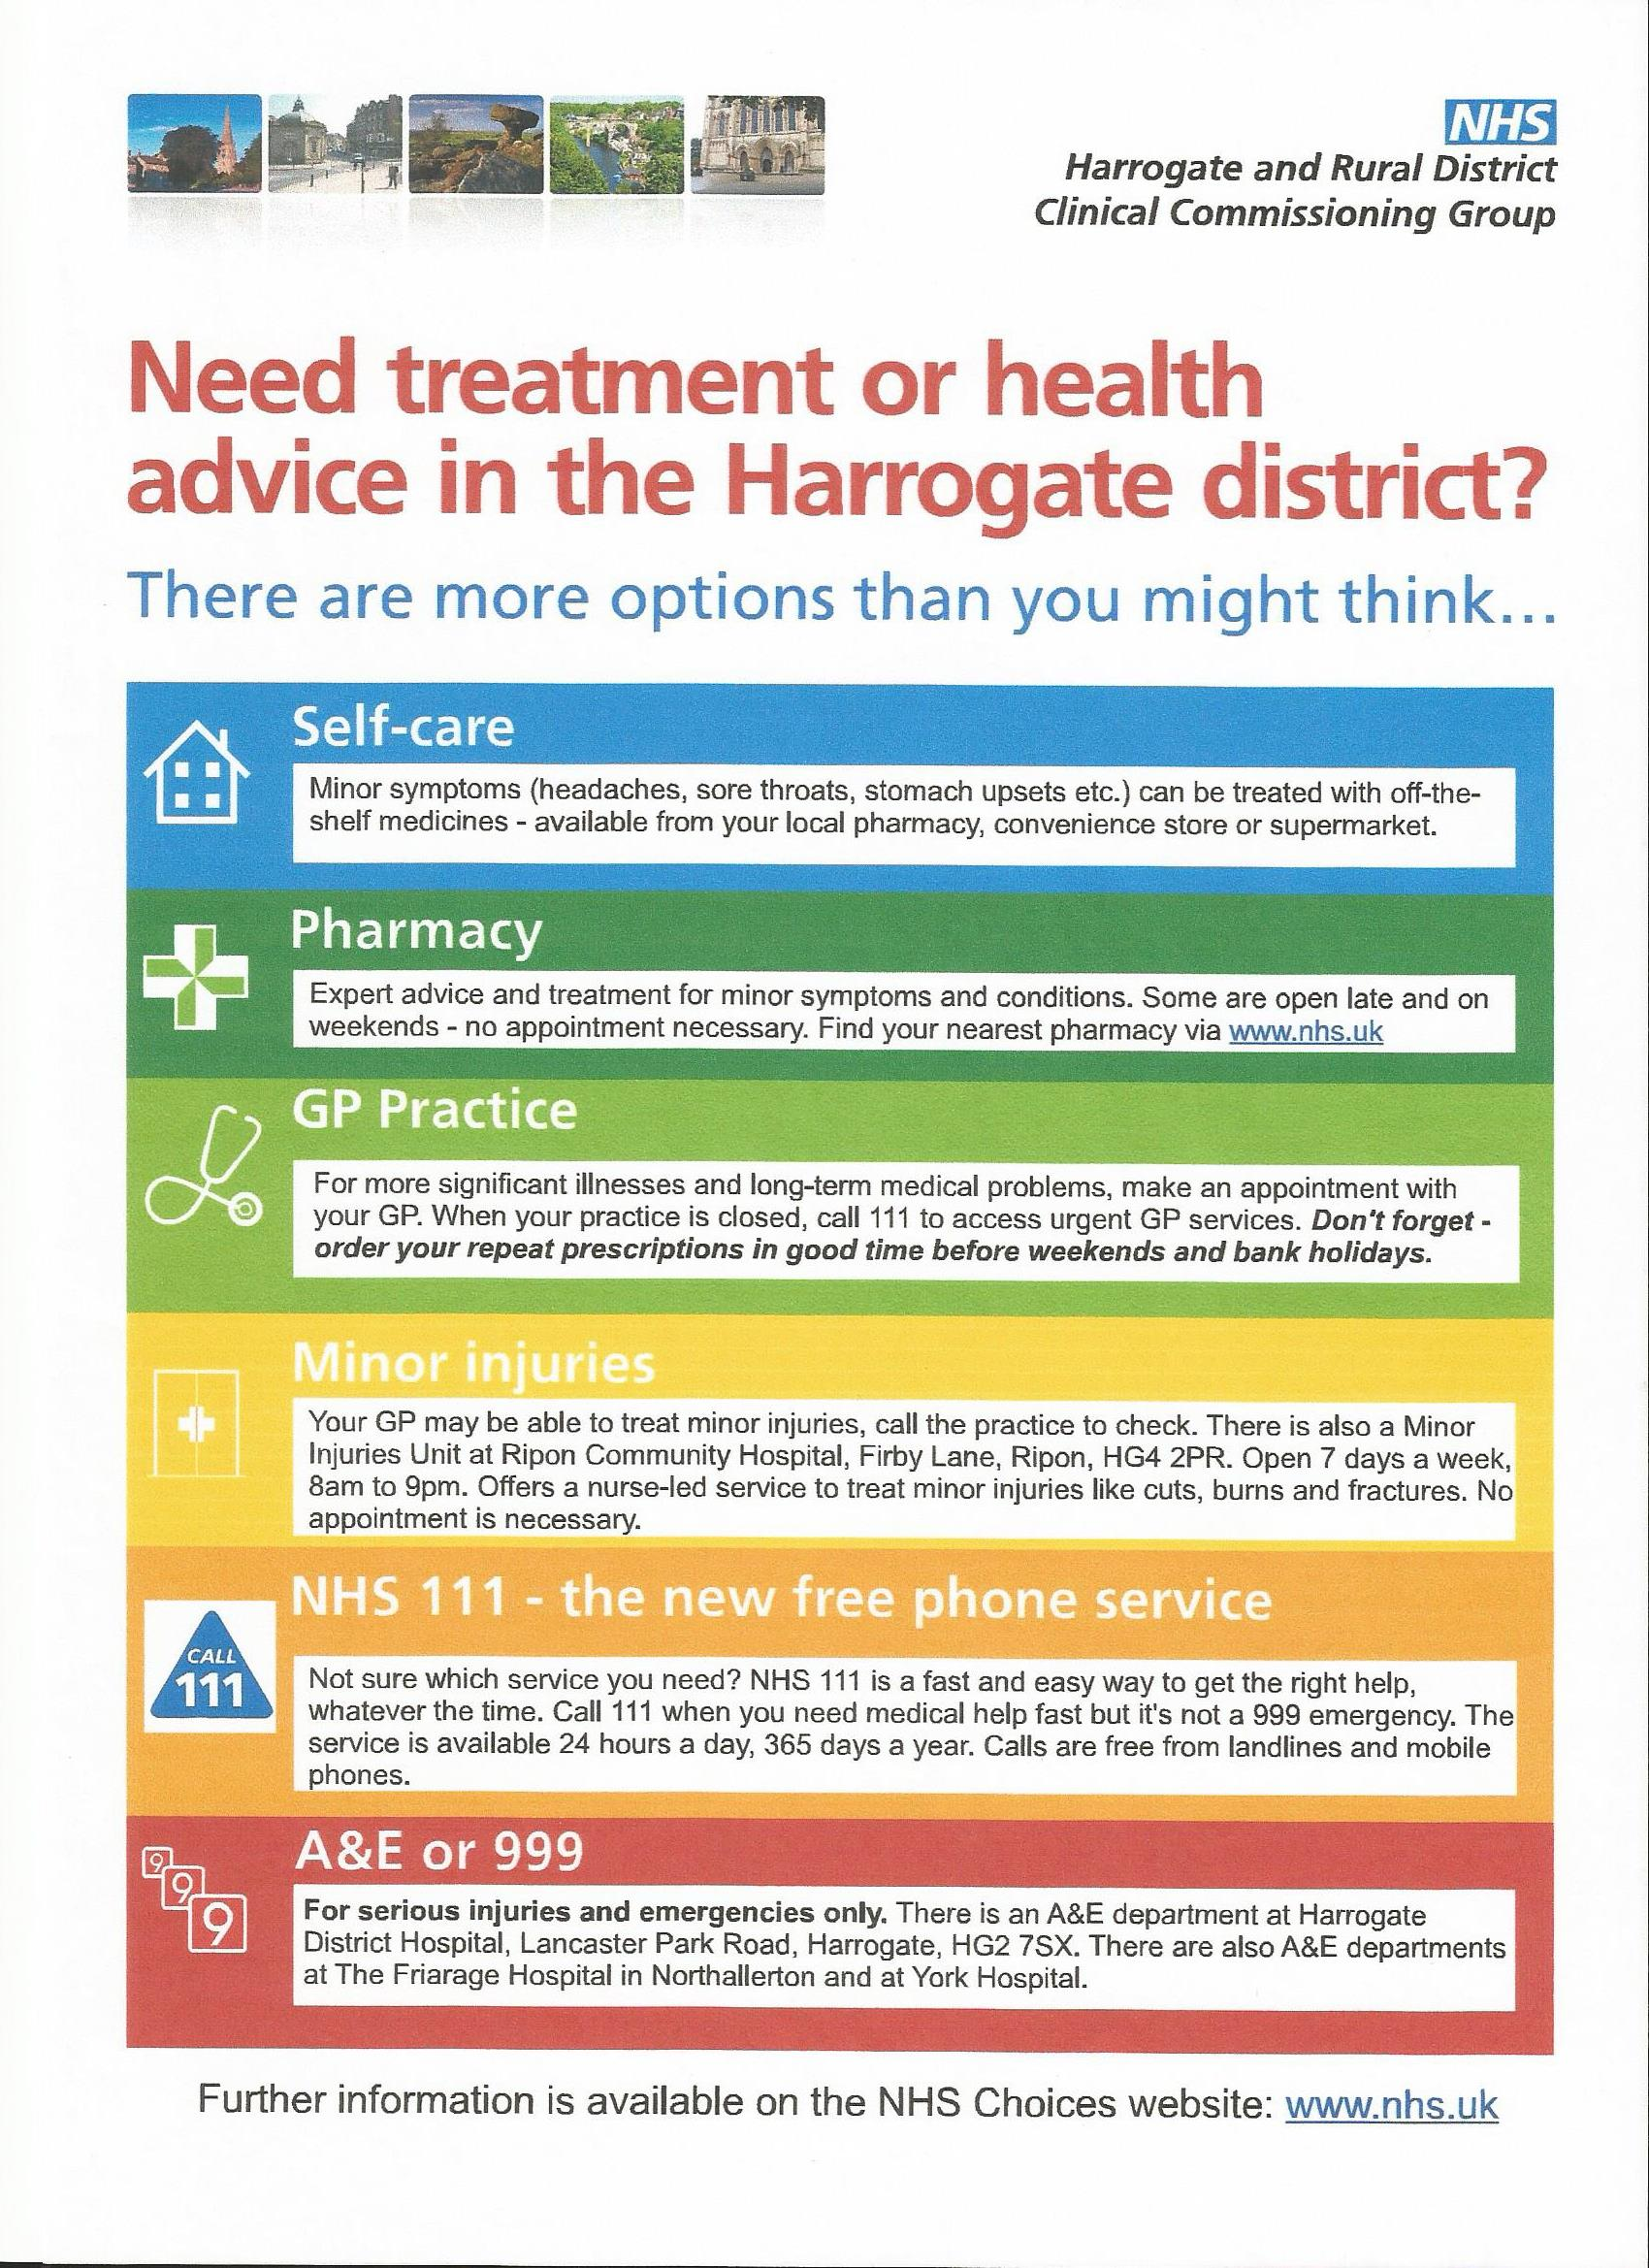 CCG Health advice and teatment scan